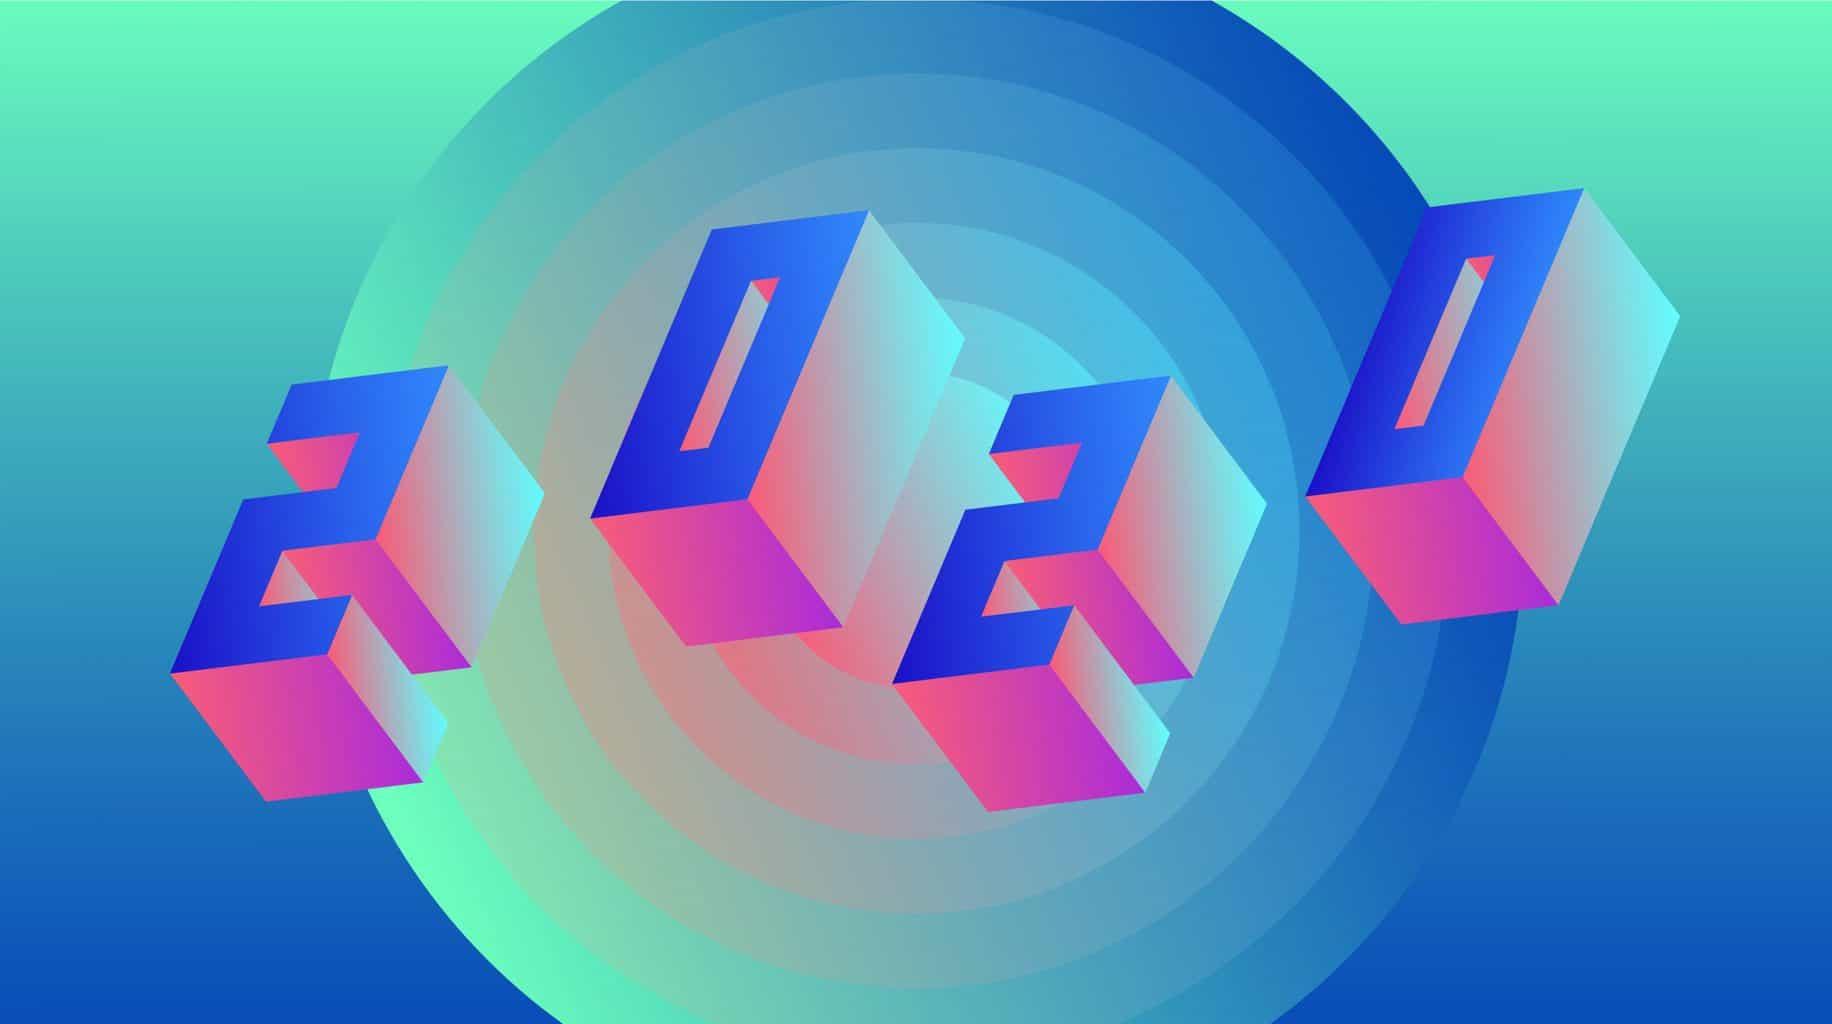 5 popular font trends for 2020